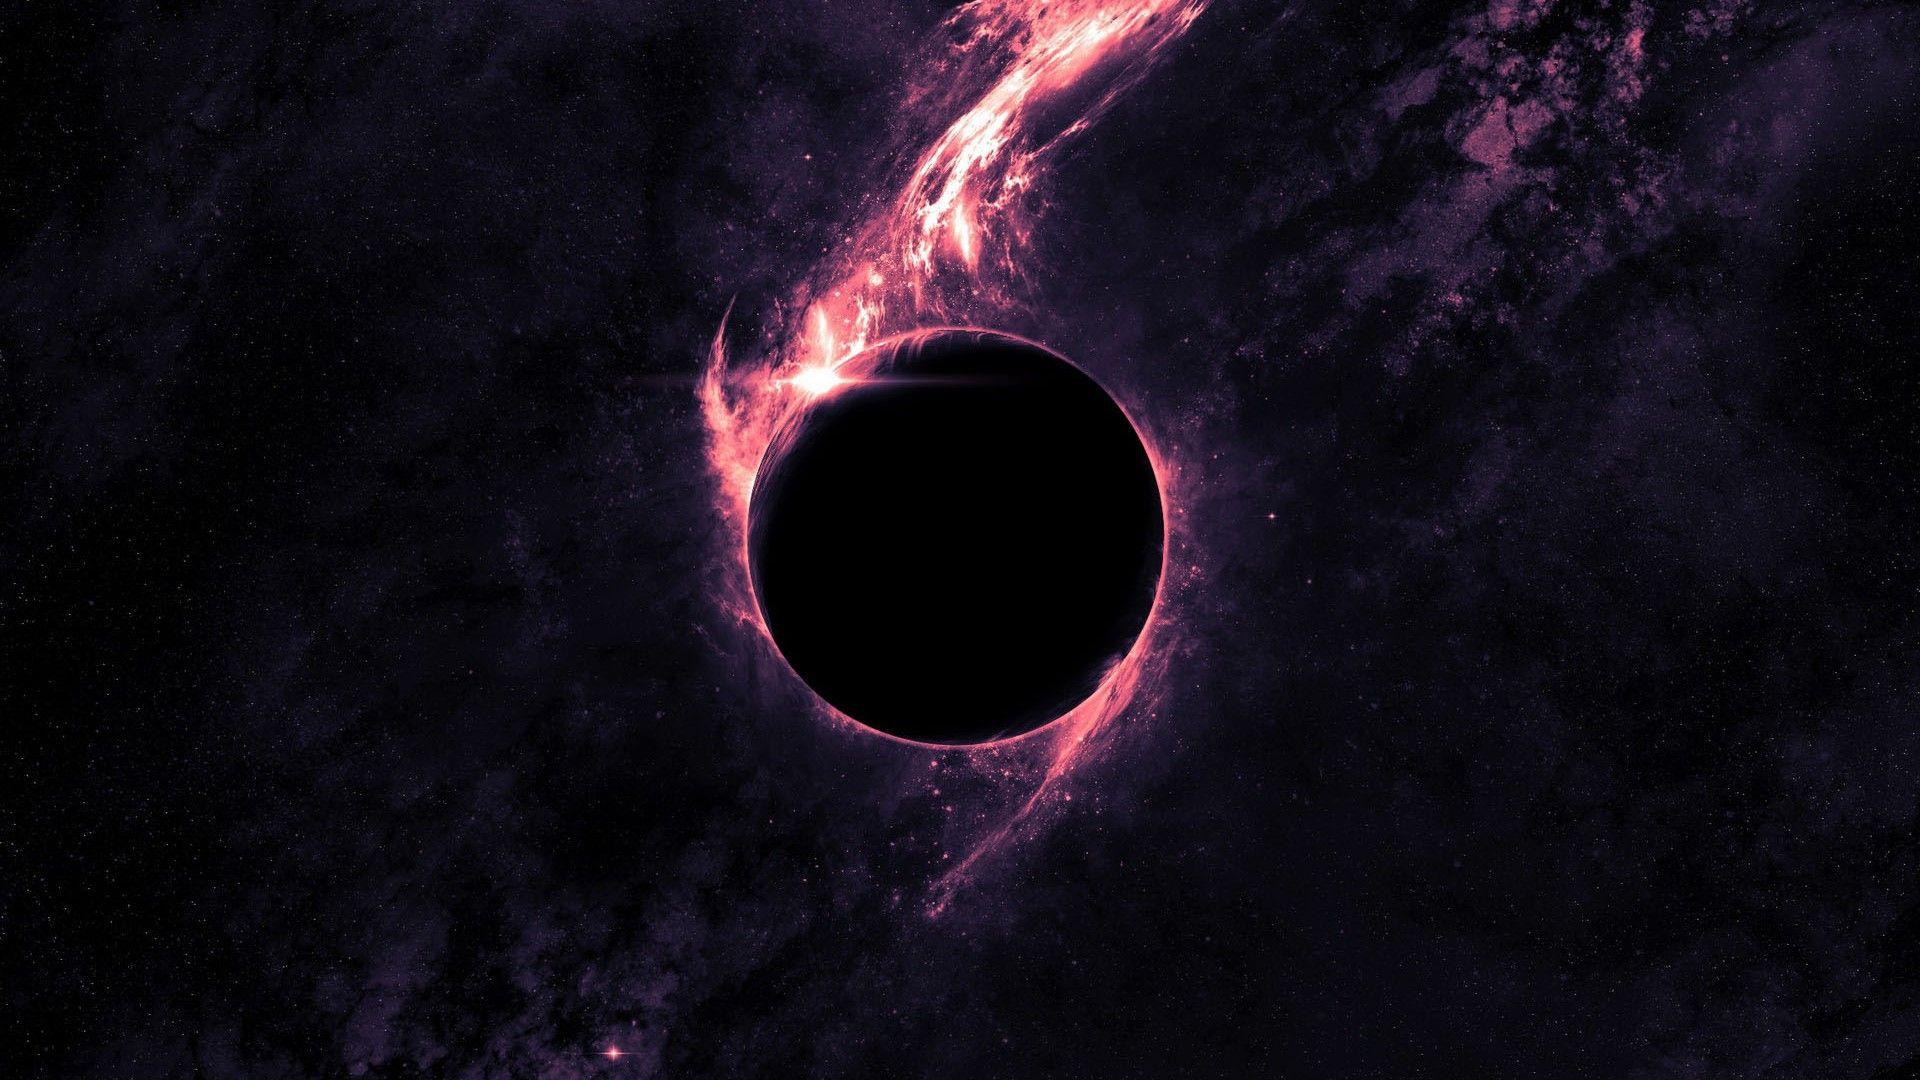 Black Hole 19201080 Followme Cooliphone6case On Twitter Facebook Google Instagram Linkedin Blo Black Hole Wallpaper Dark Purple Wallpaper Black Hole